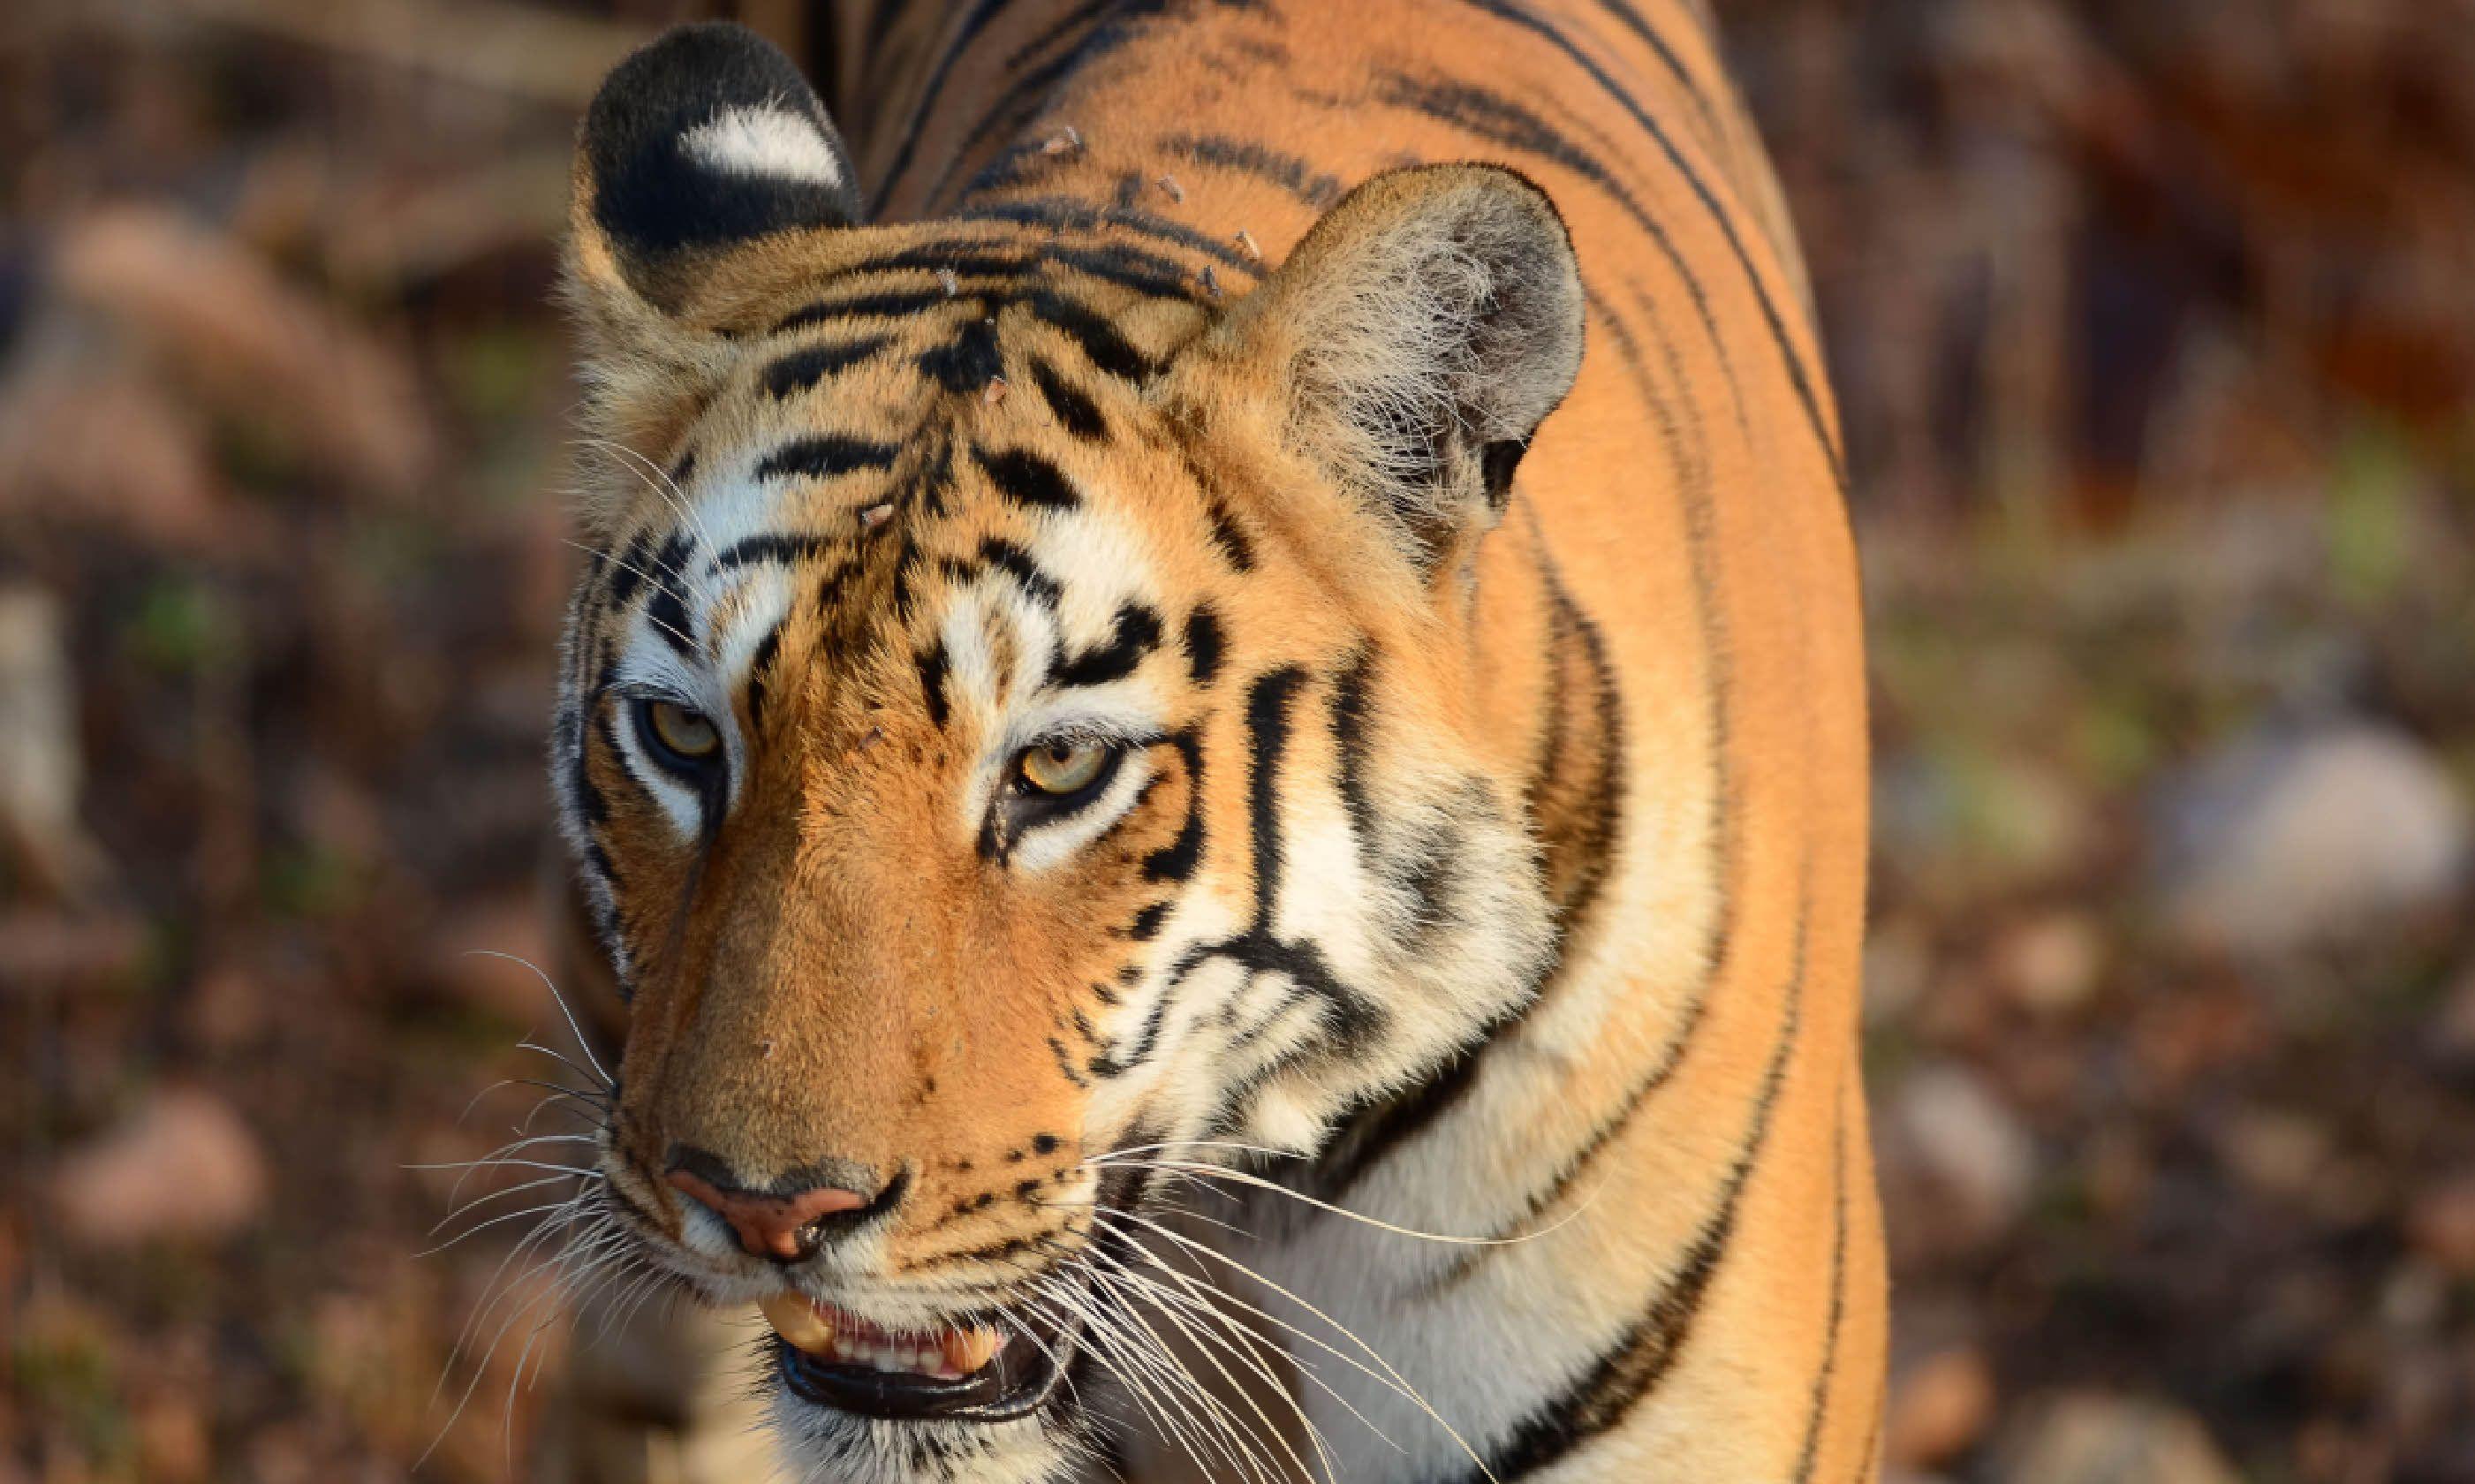 Wild tiger (Dreamstime)